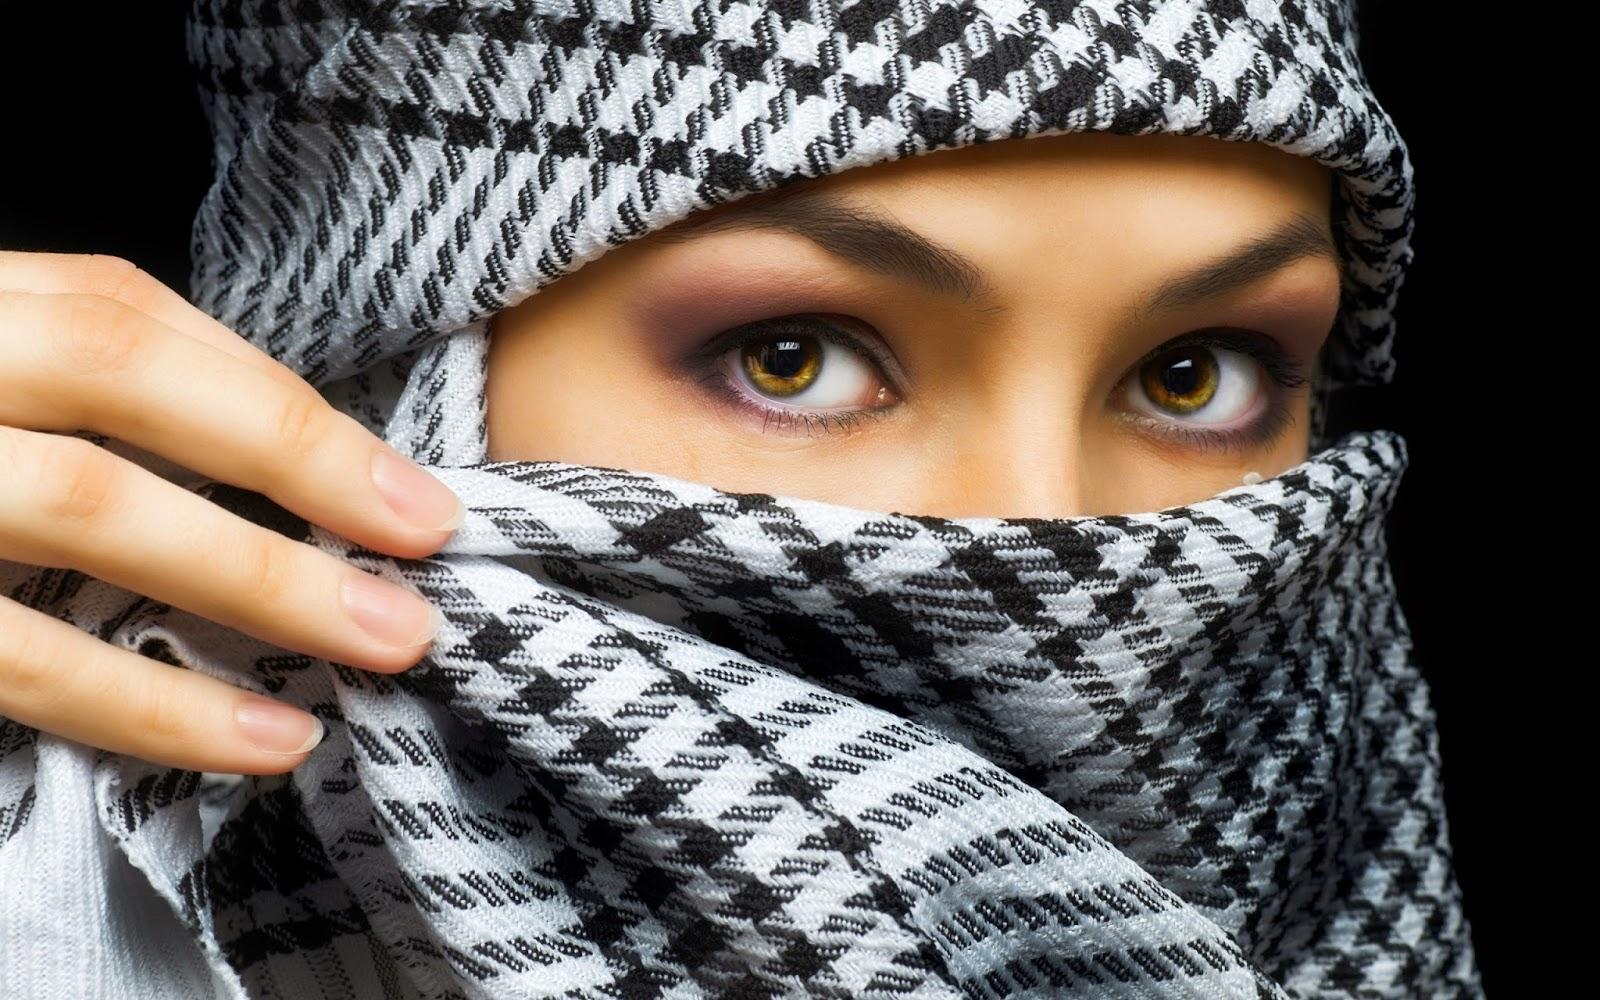 Veil Beautiful Girls Hd Wallpepars-Naqab Girls Hd -6379